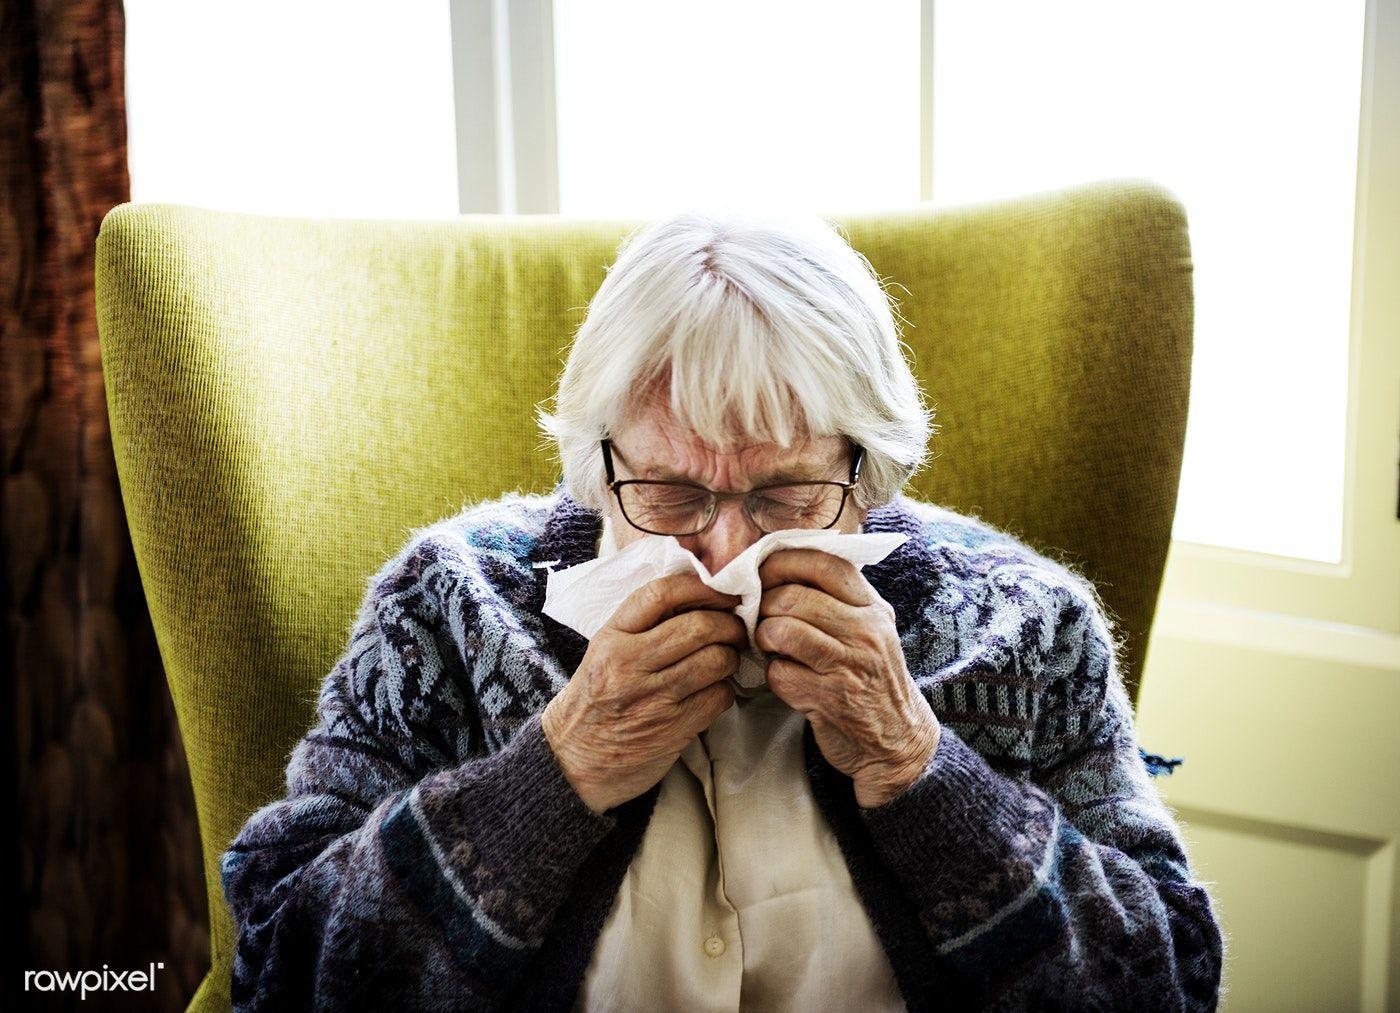 Download premium image of Senior woman sneezing 378785